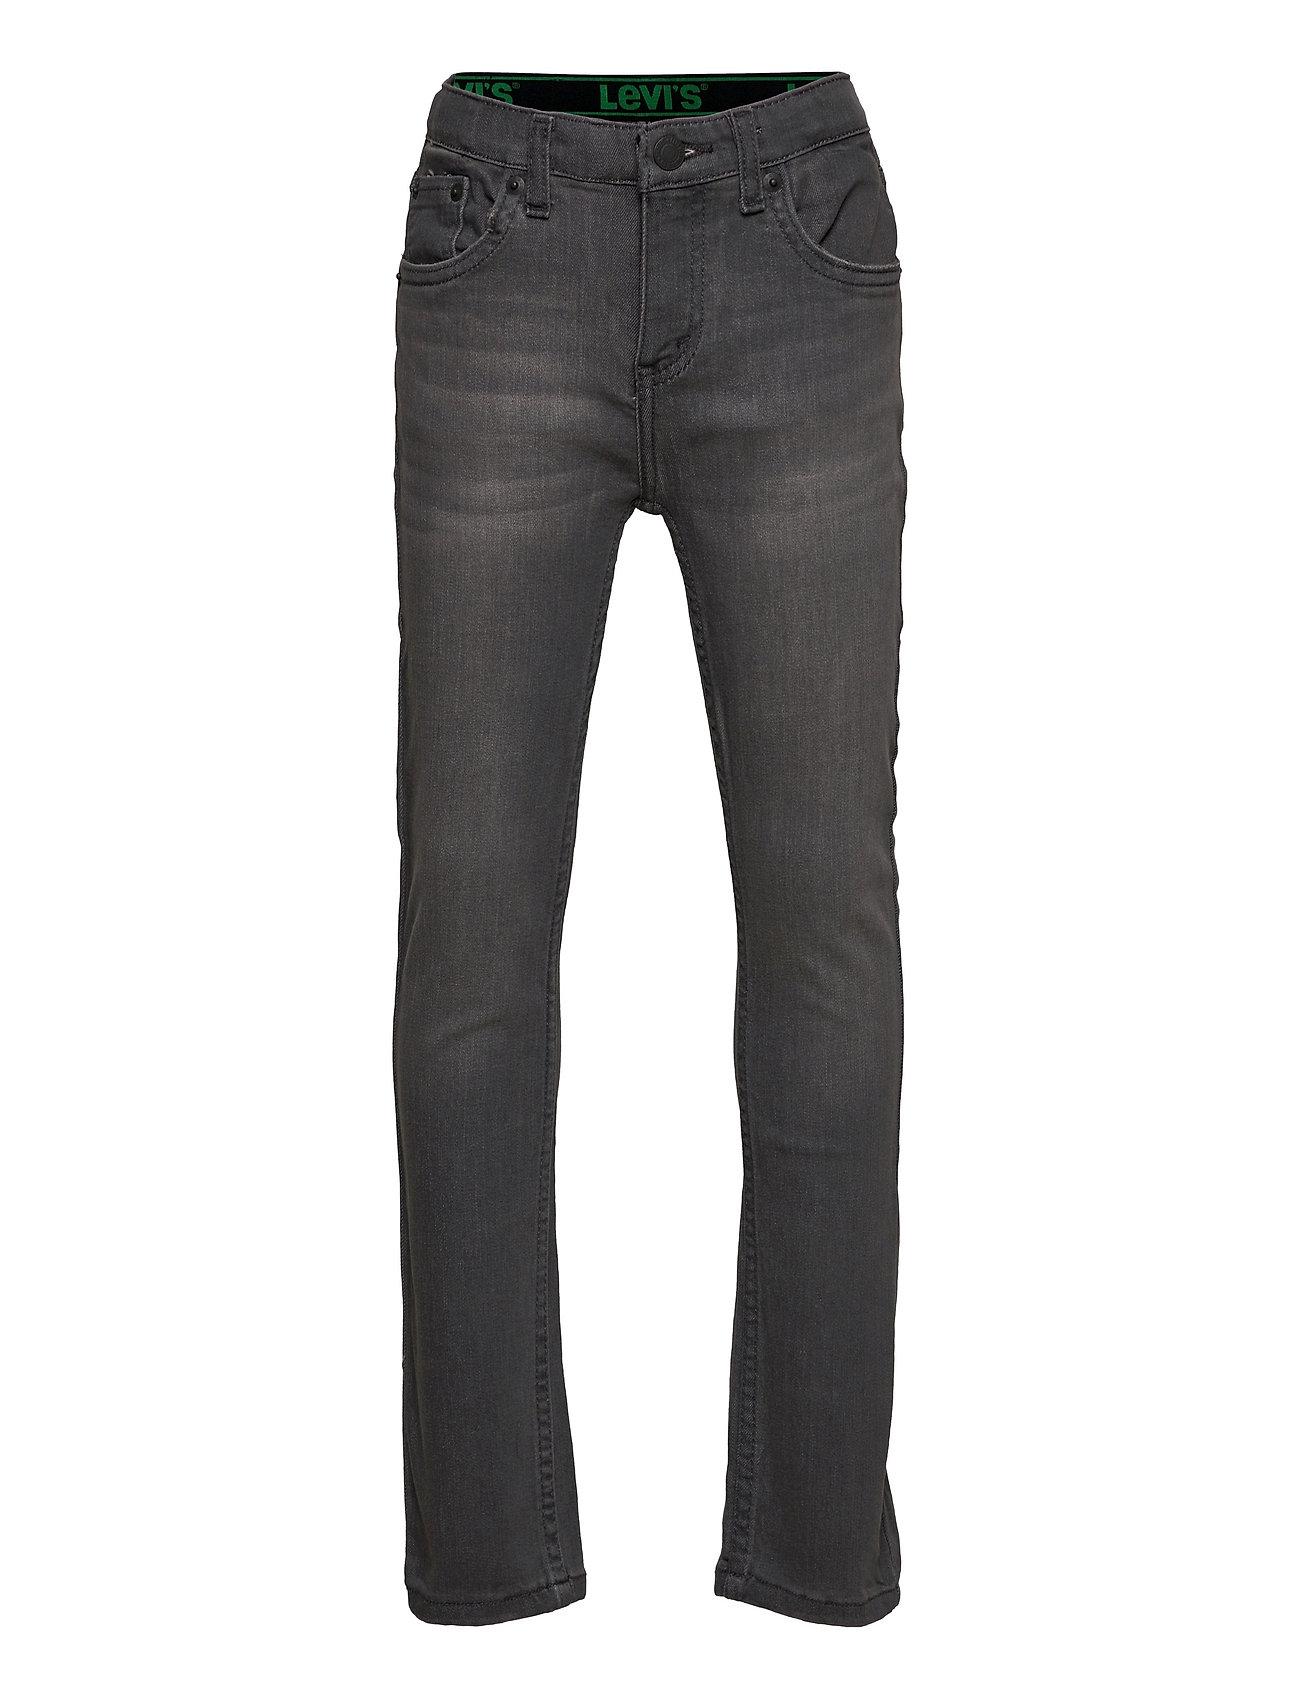 Lvb 510 Eco Soft Performance J Jeans Sort Levi's